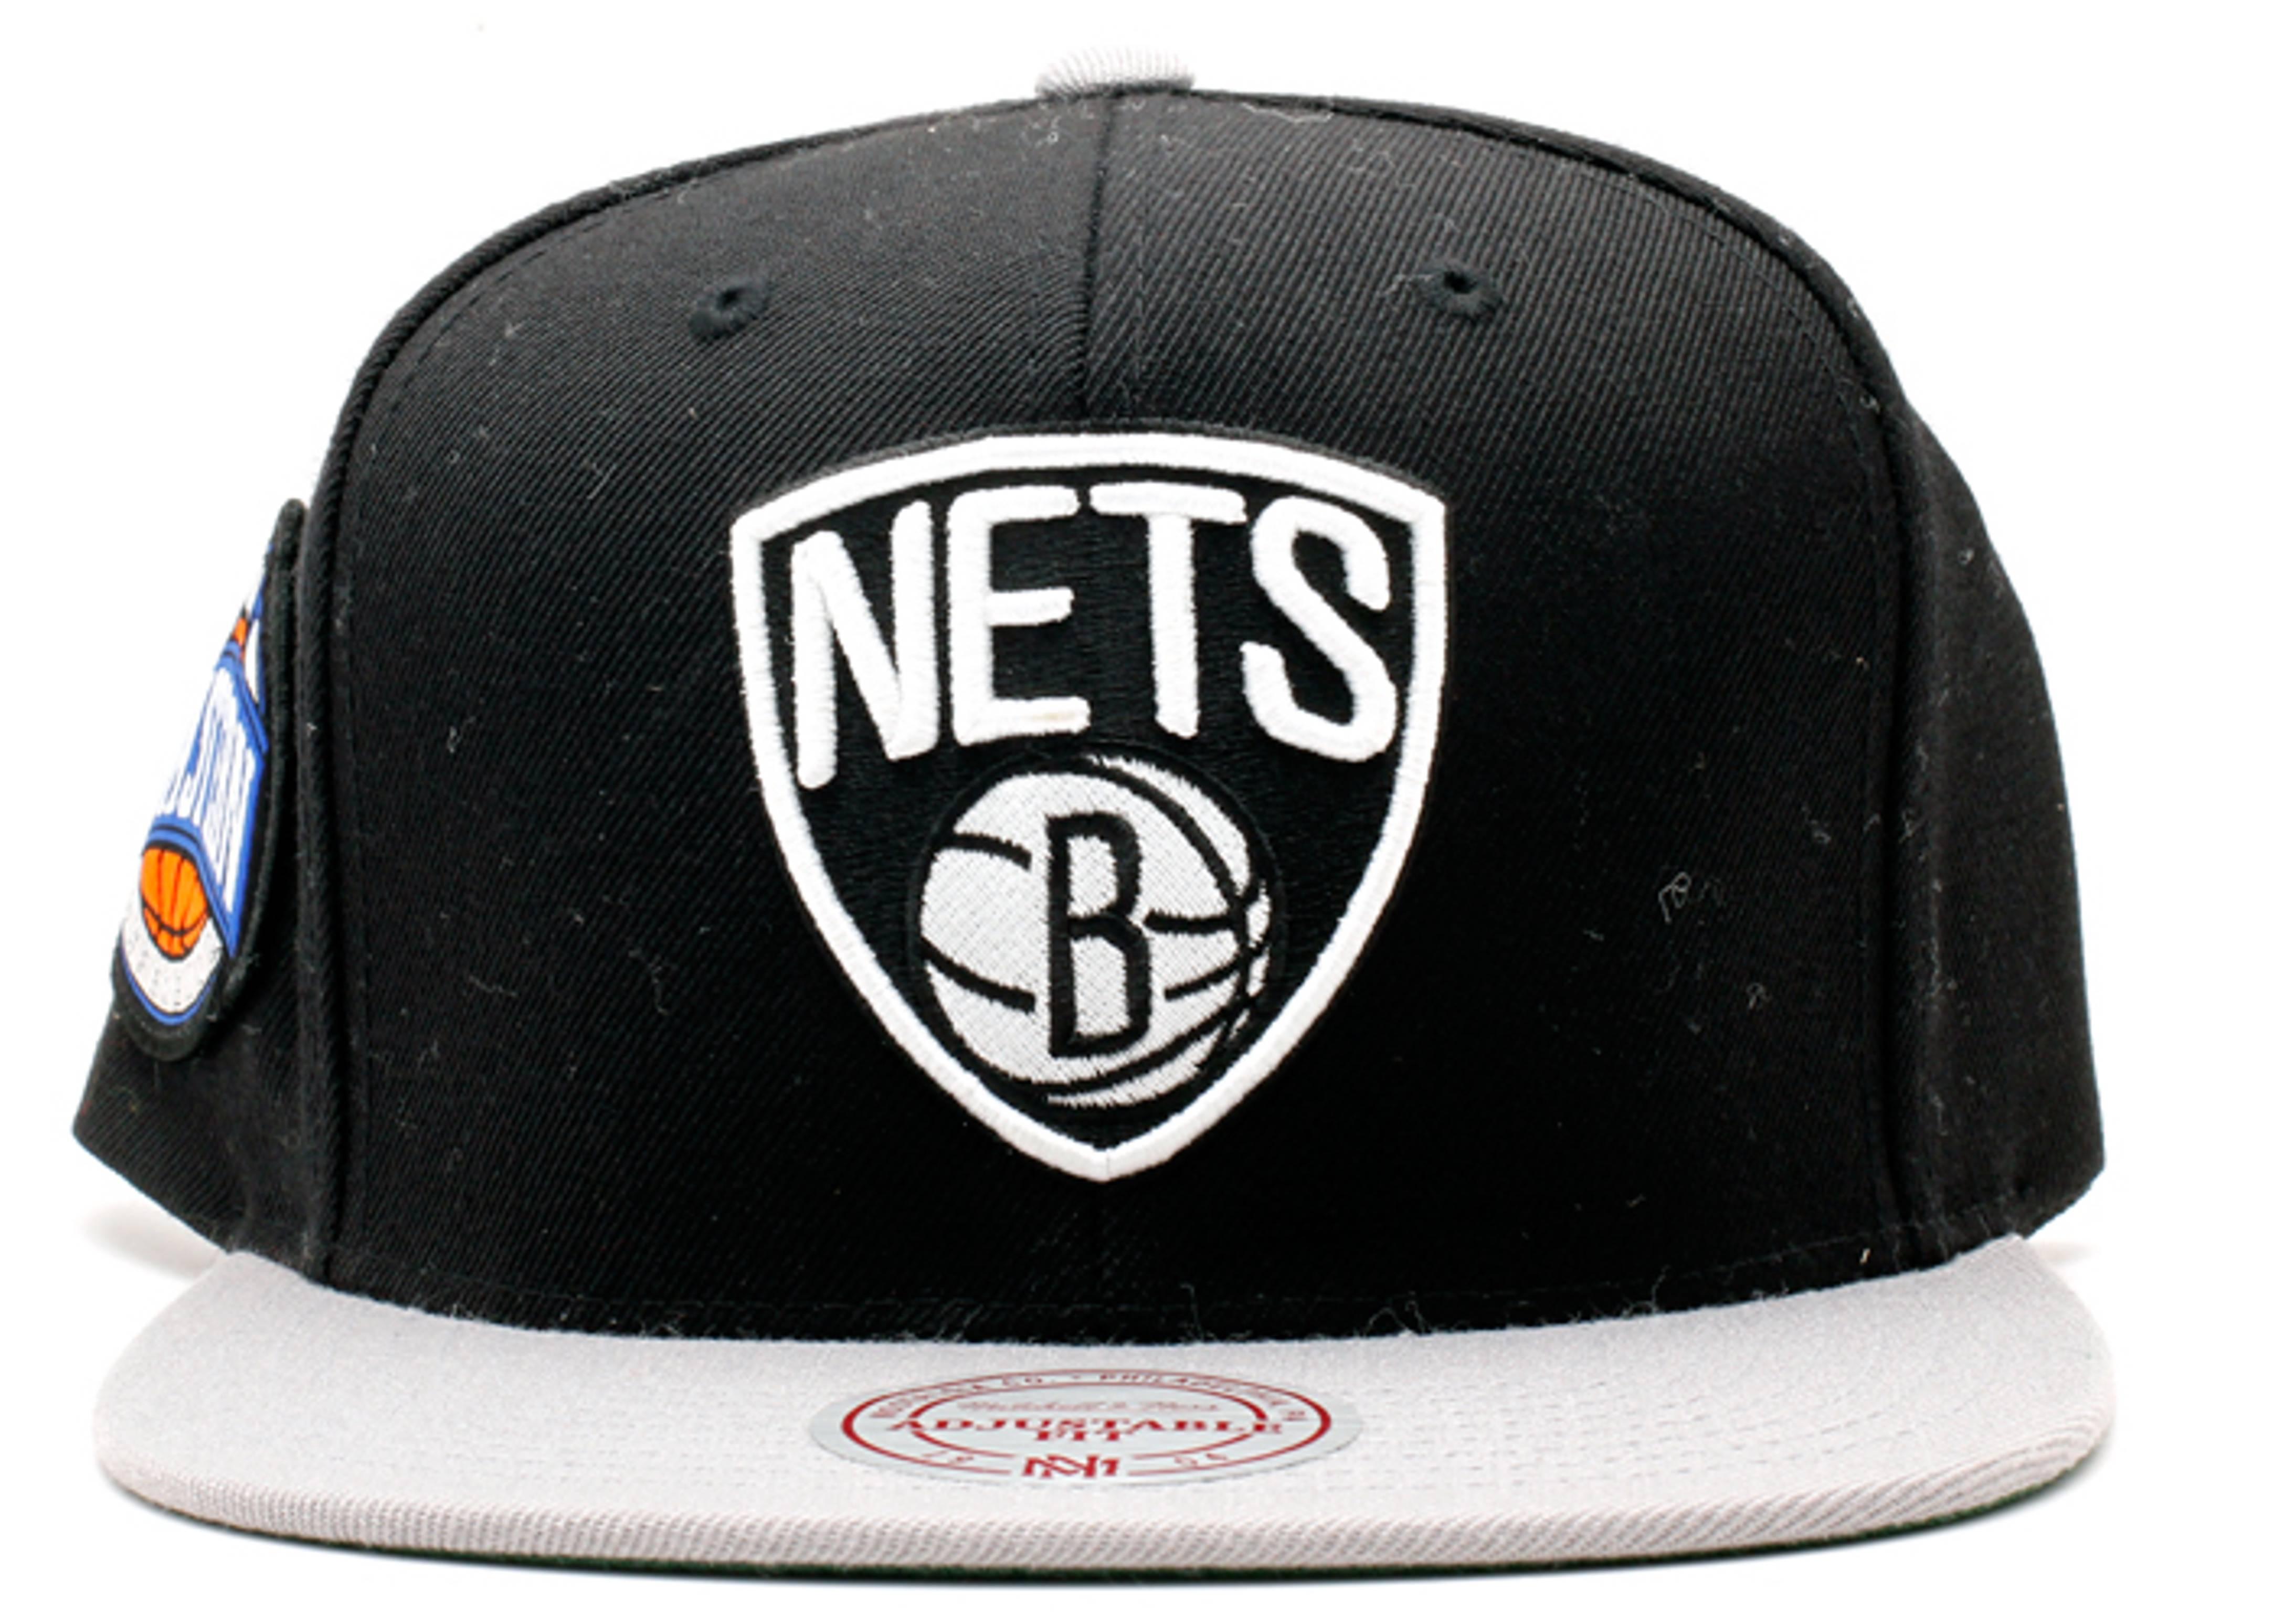 d4985636b6c Brooklyn Nets Snap-back